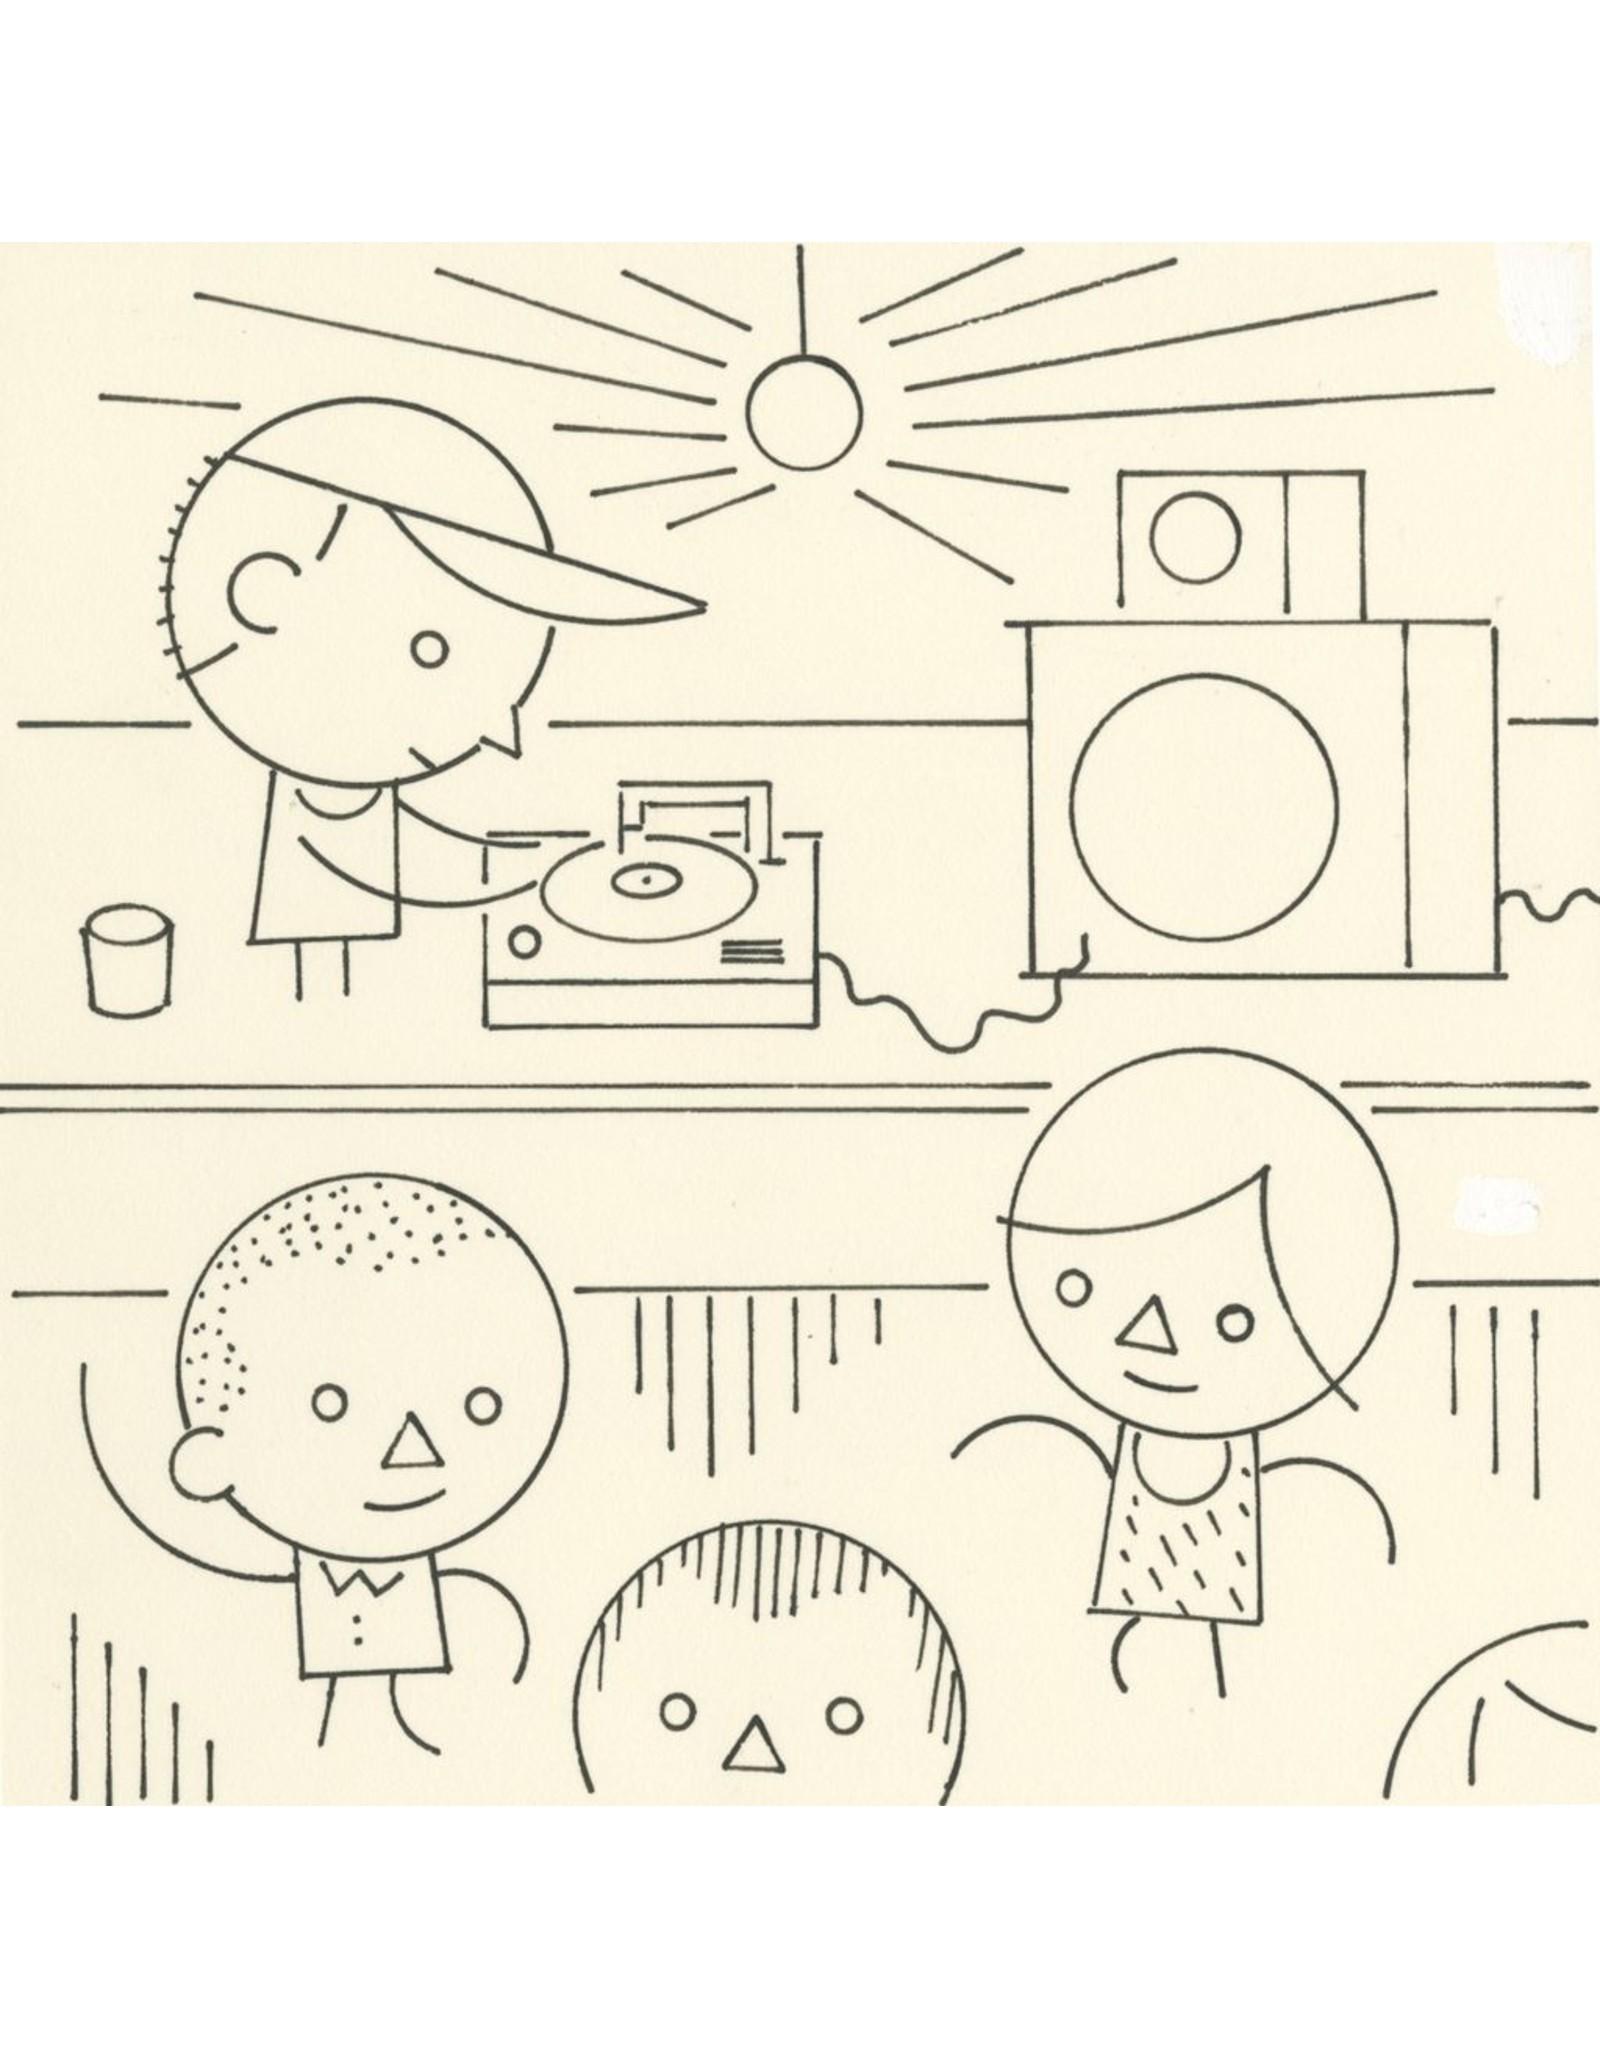 Ivan Brunetti DJ, Illustration by Ivan Brunetti for the New Yorker, Goings On About Town, September 12, 2013